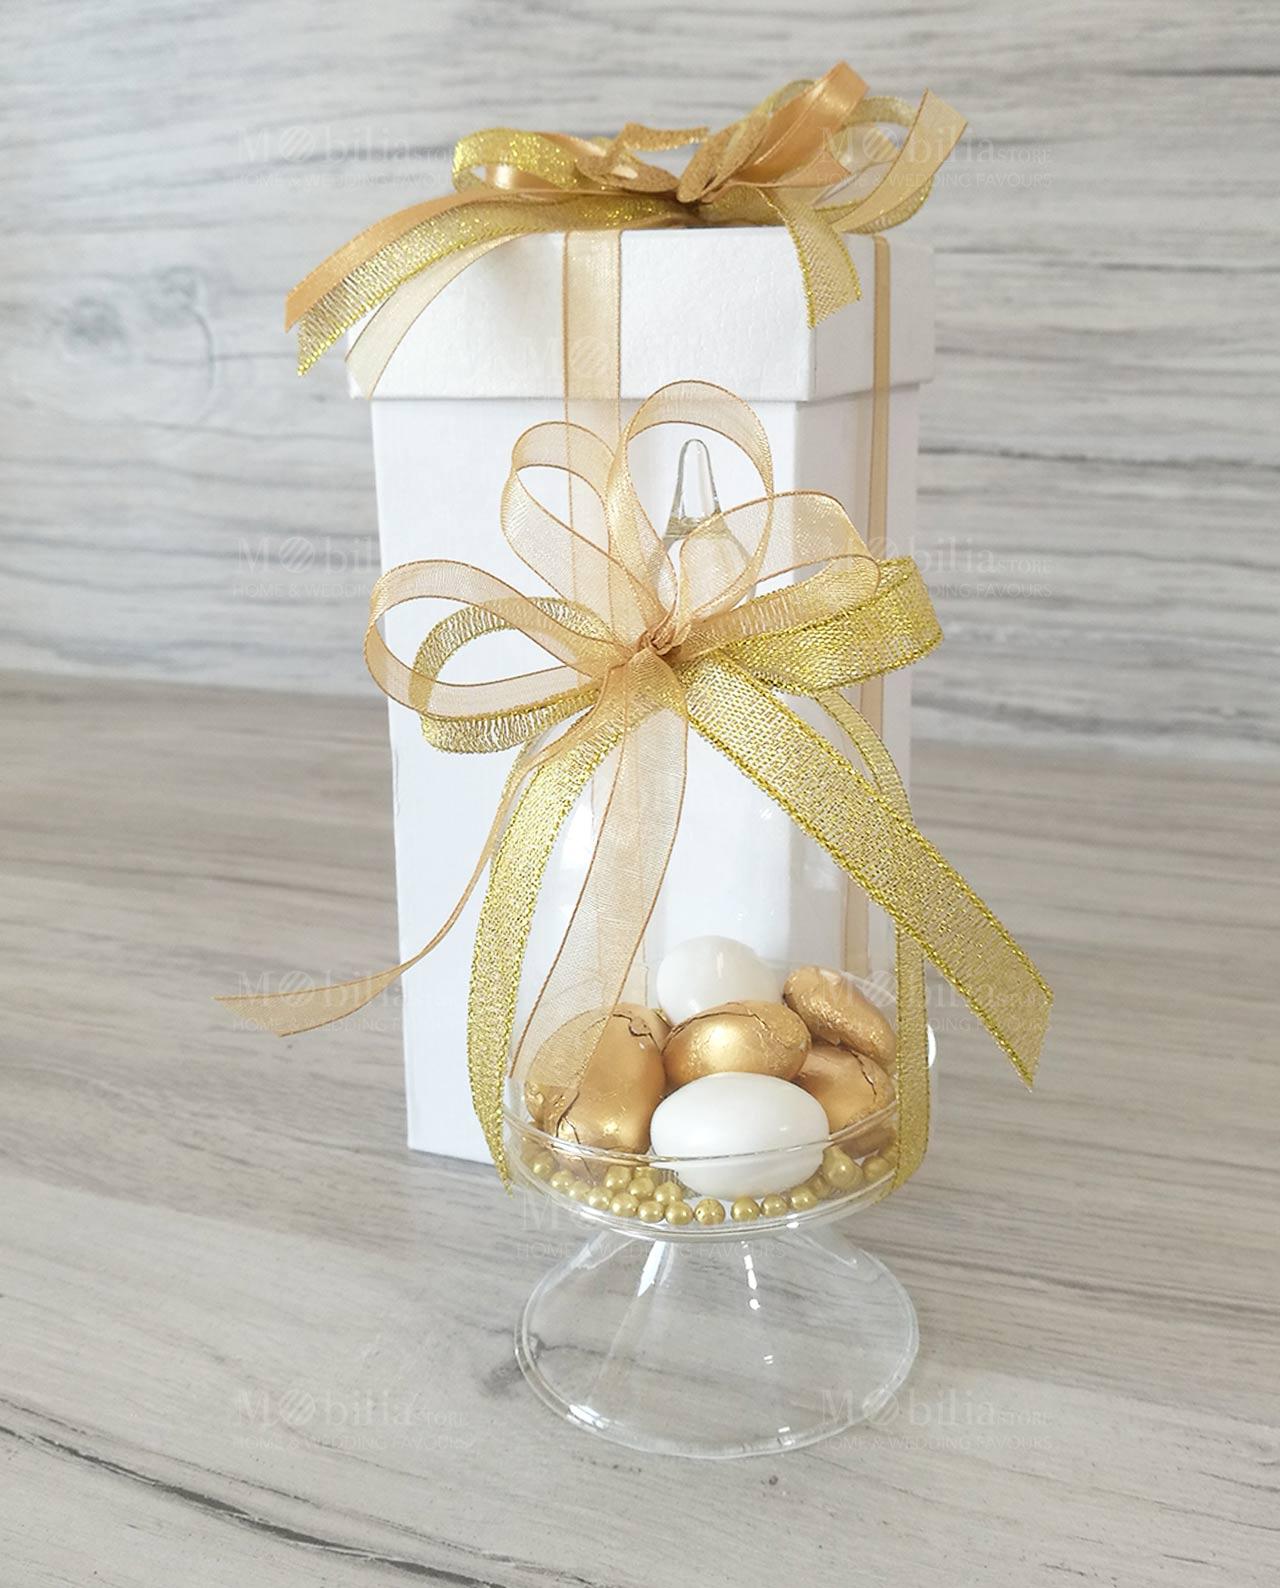 Bomboniera Matrimonio Natalizio : Idee bomboniere nozze d oro xd regardsdefemmes